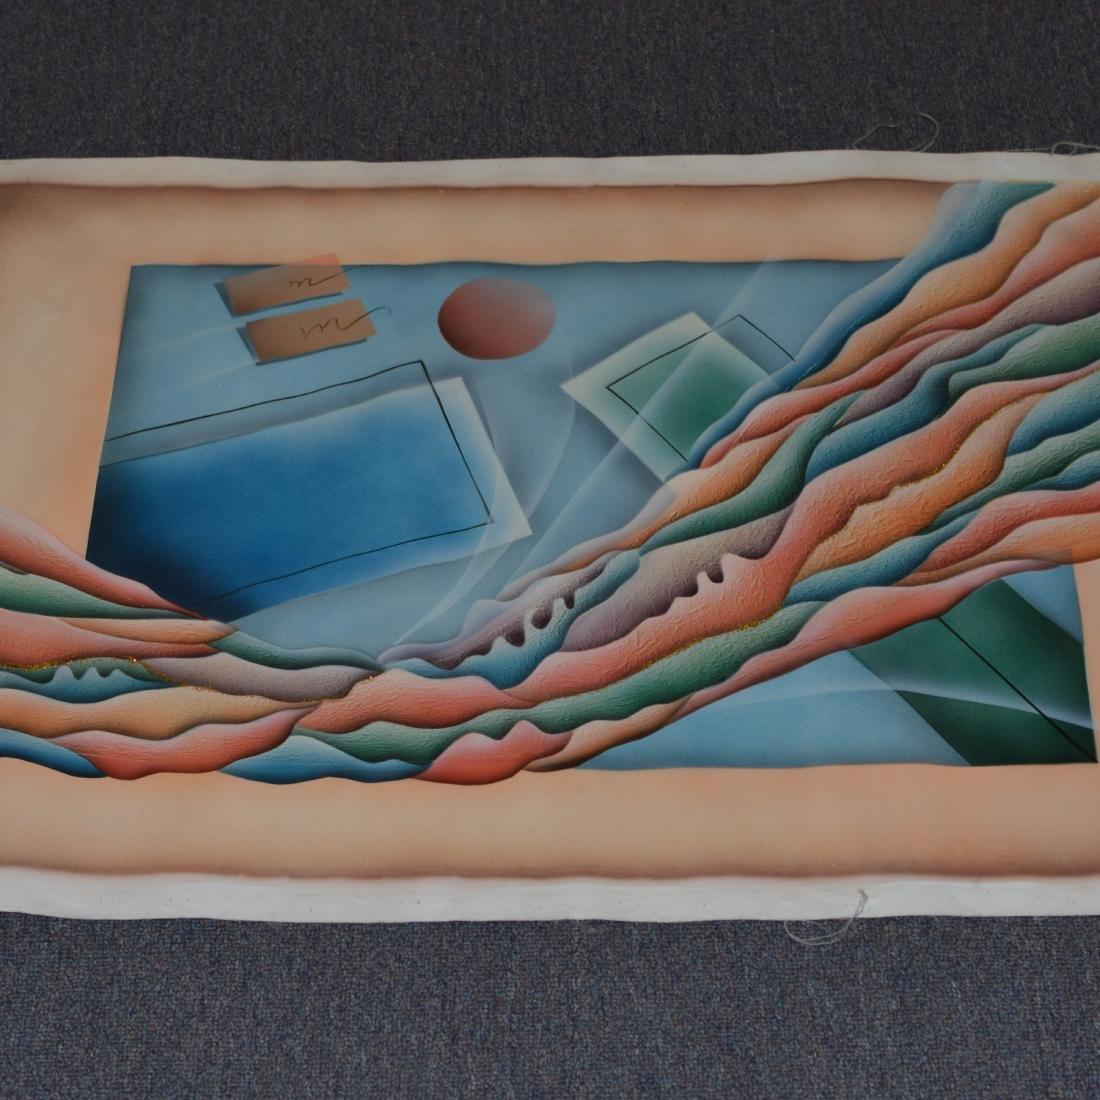 Décor oil painting